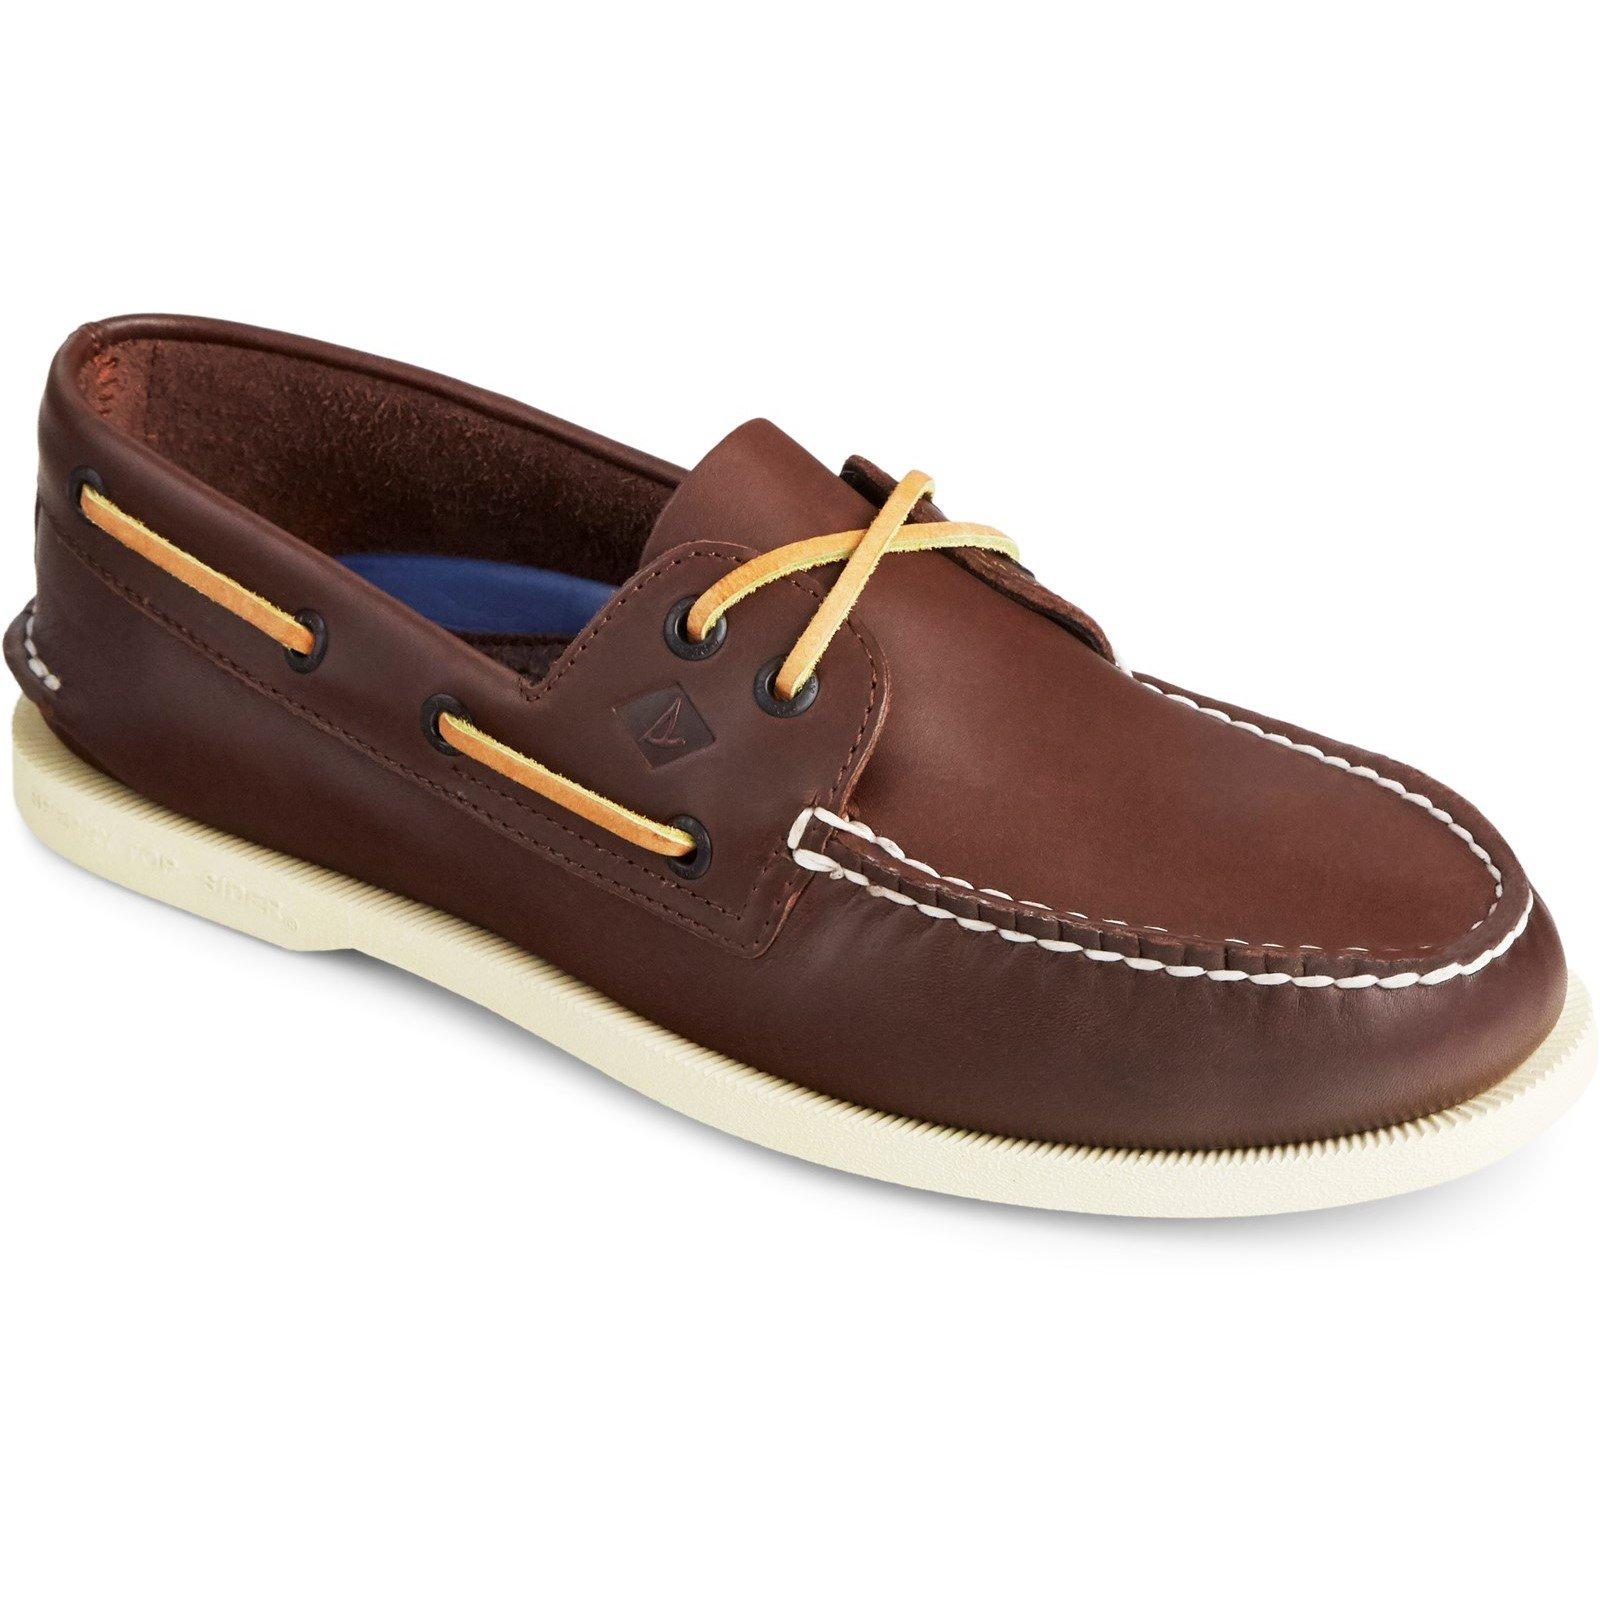 Sperry Men's Authentic Original Leather Boat Shoe Various Colours 31524 - Brown 13